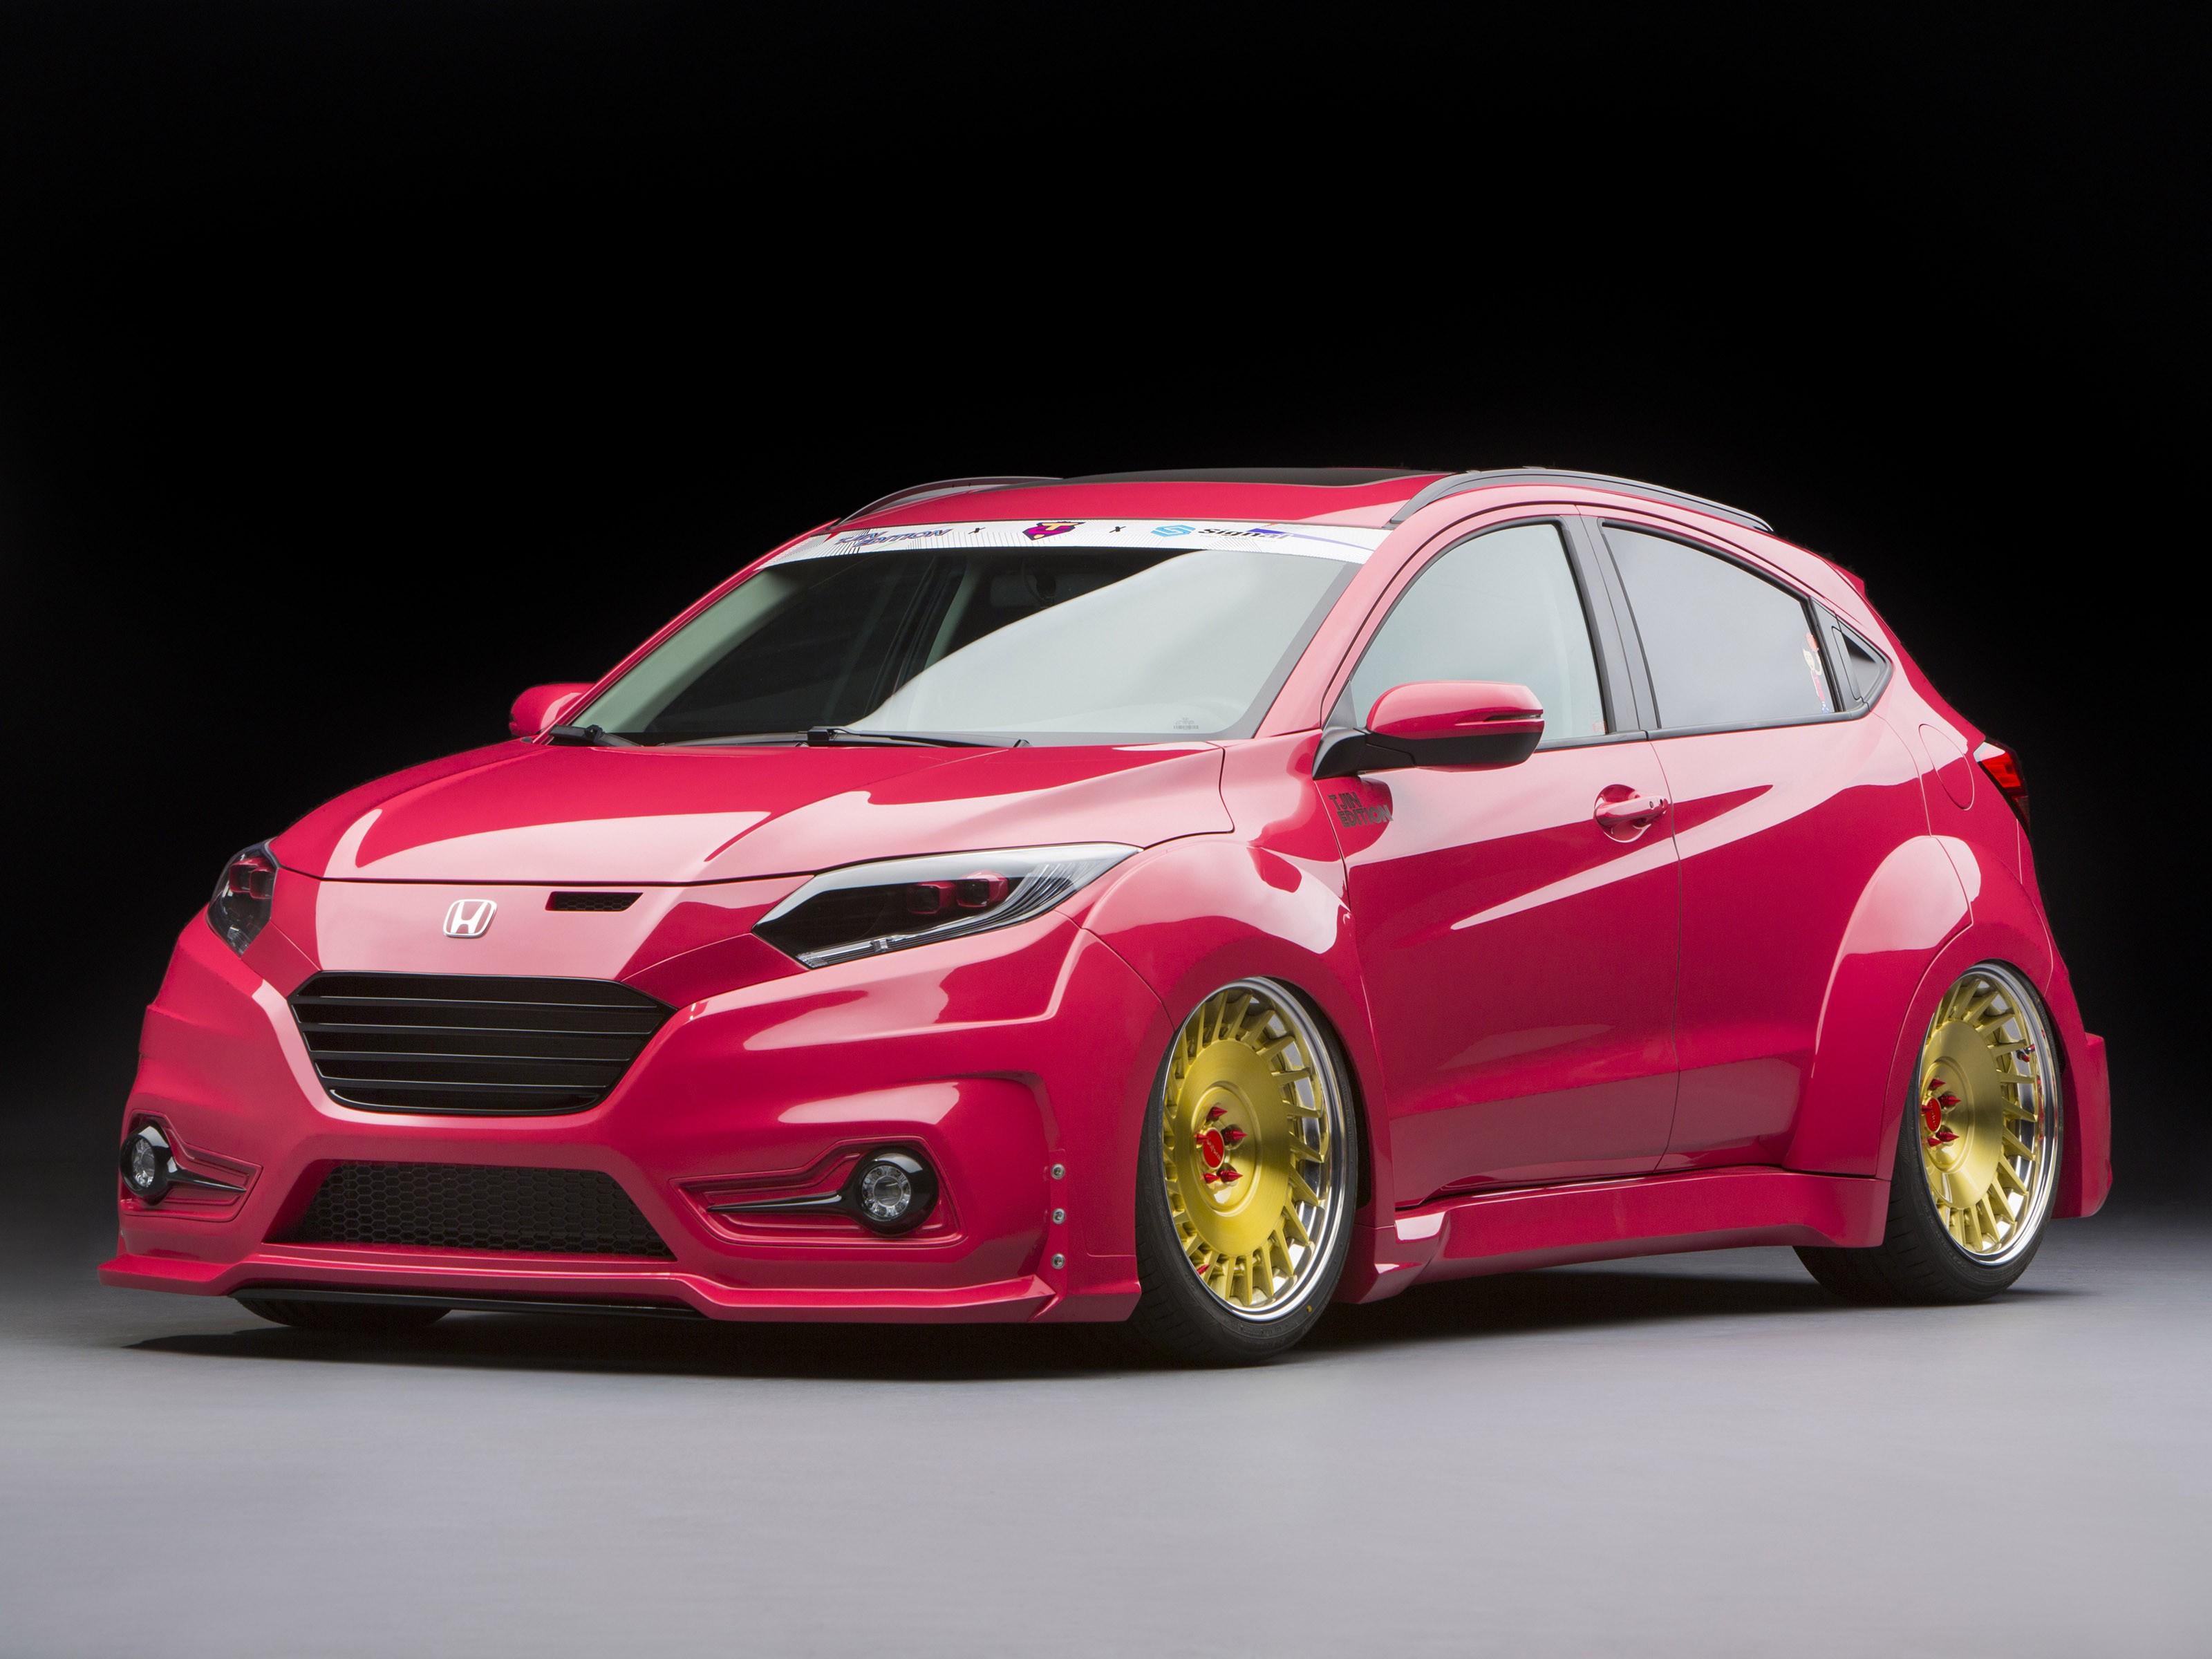 2015 Honda HR-V by Tjin Edition